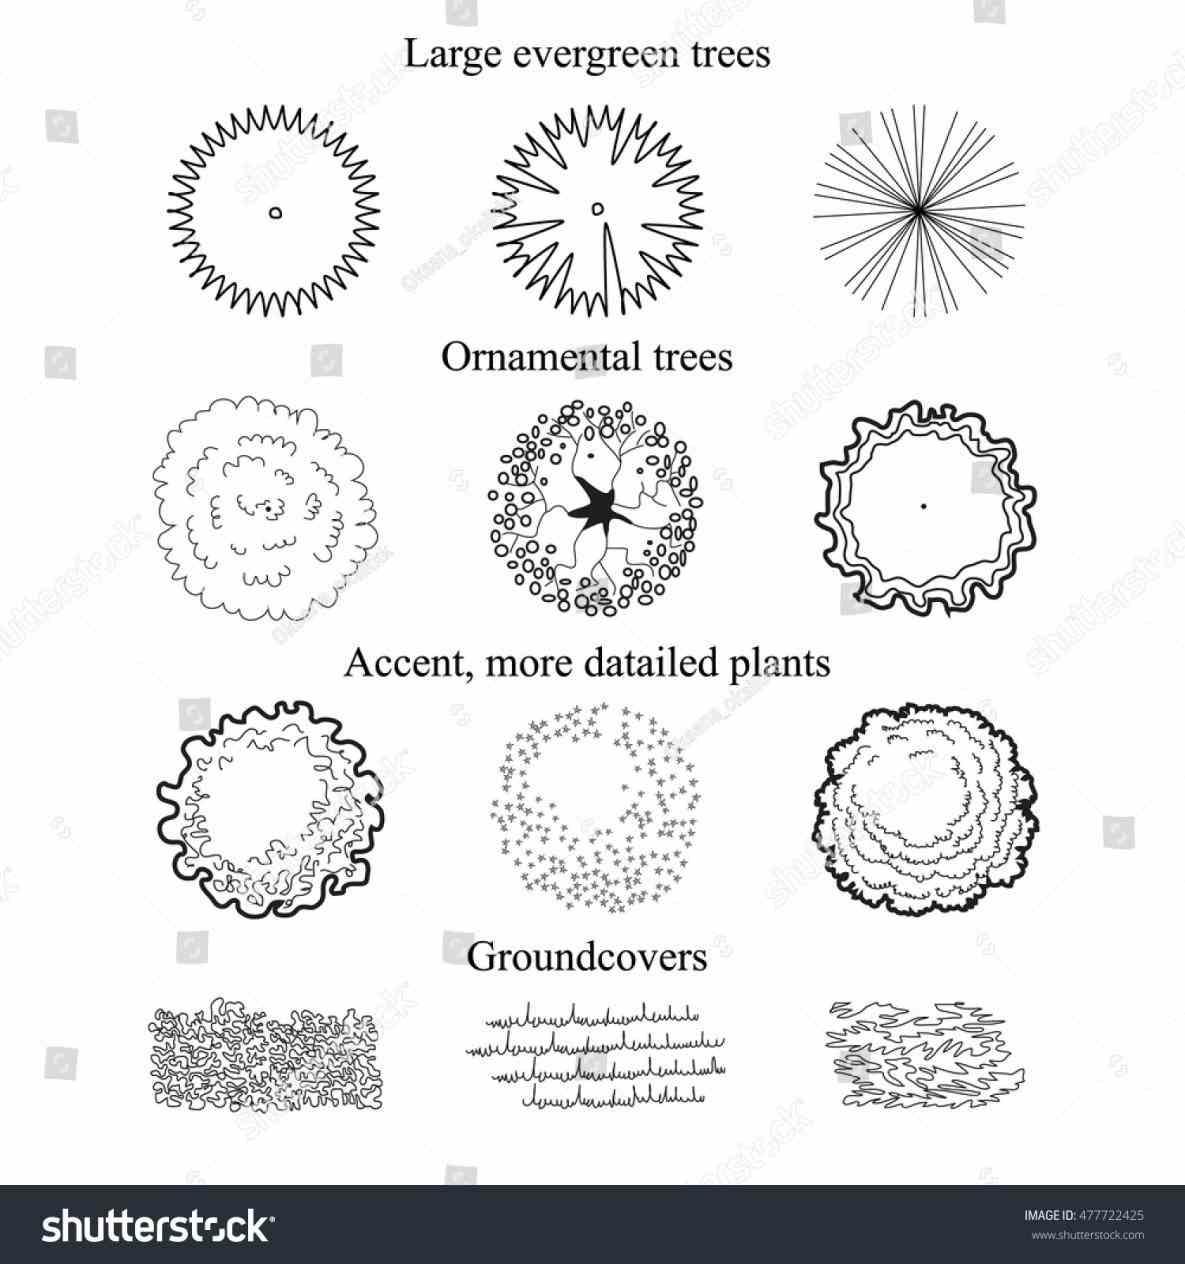 Bush clipart plan. Tree landscape design abstract